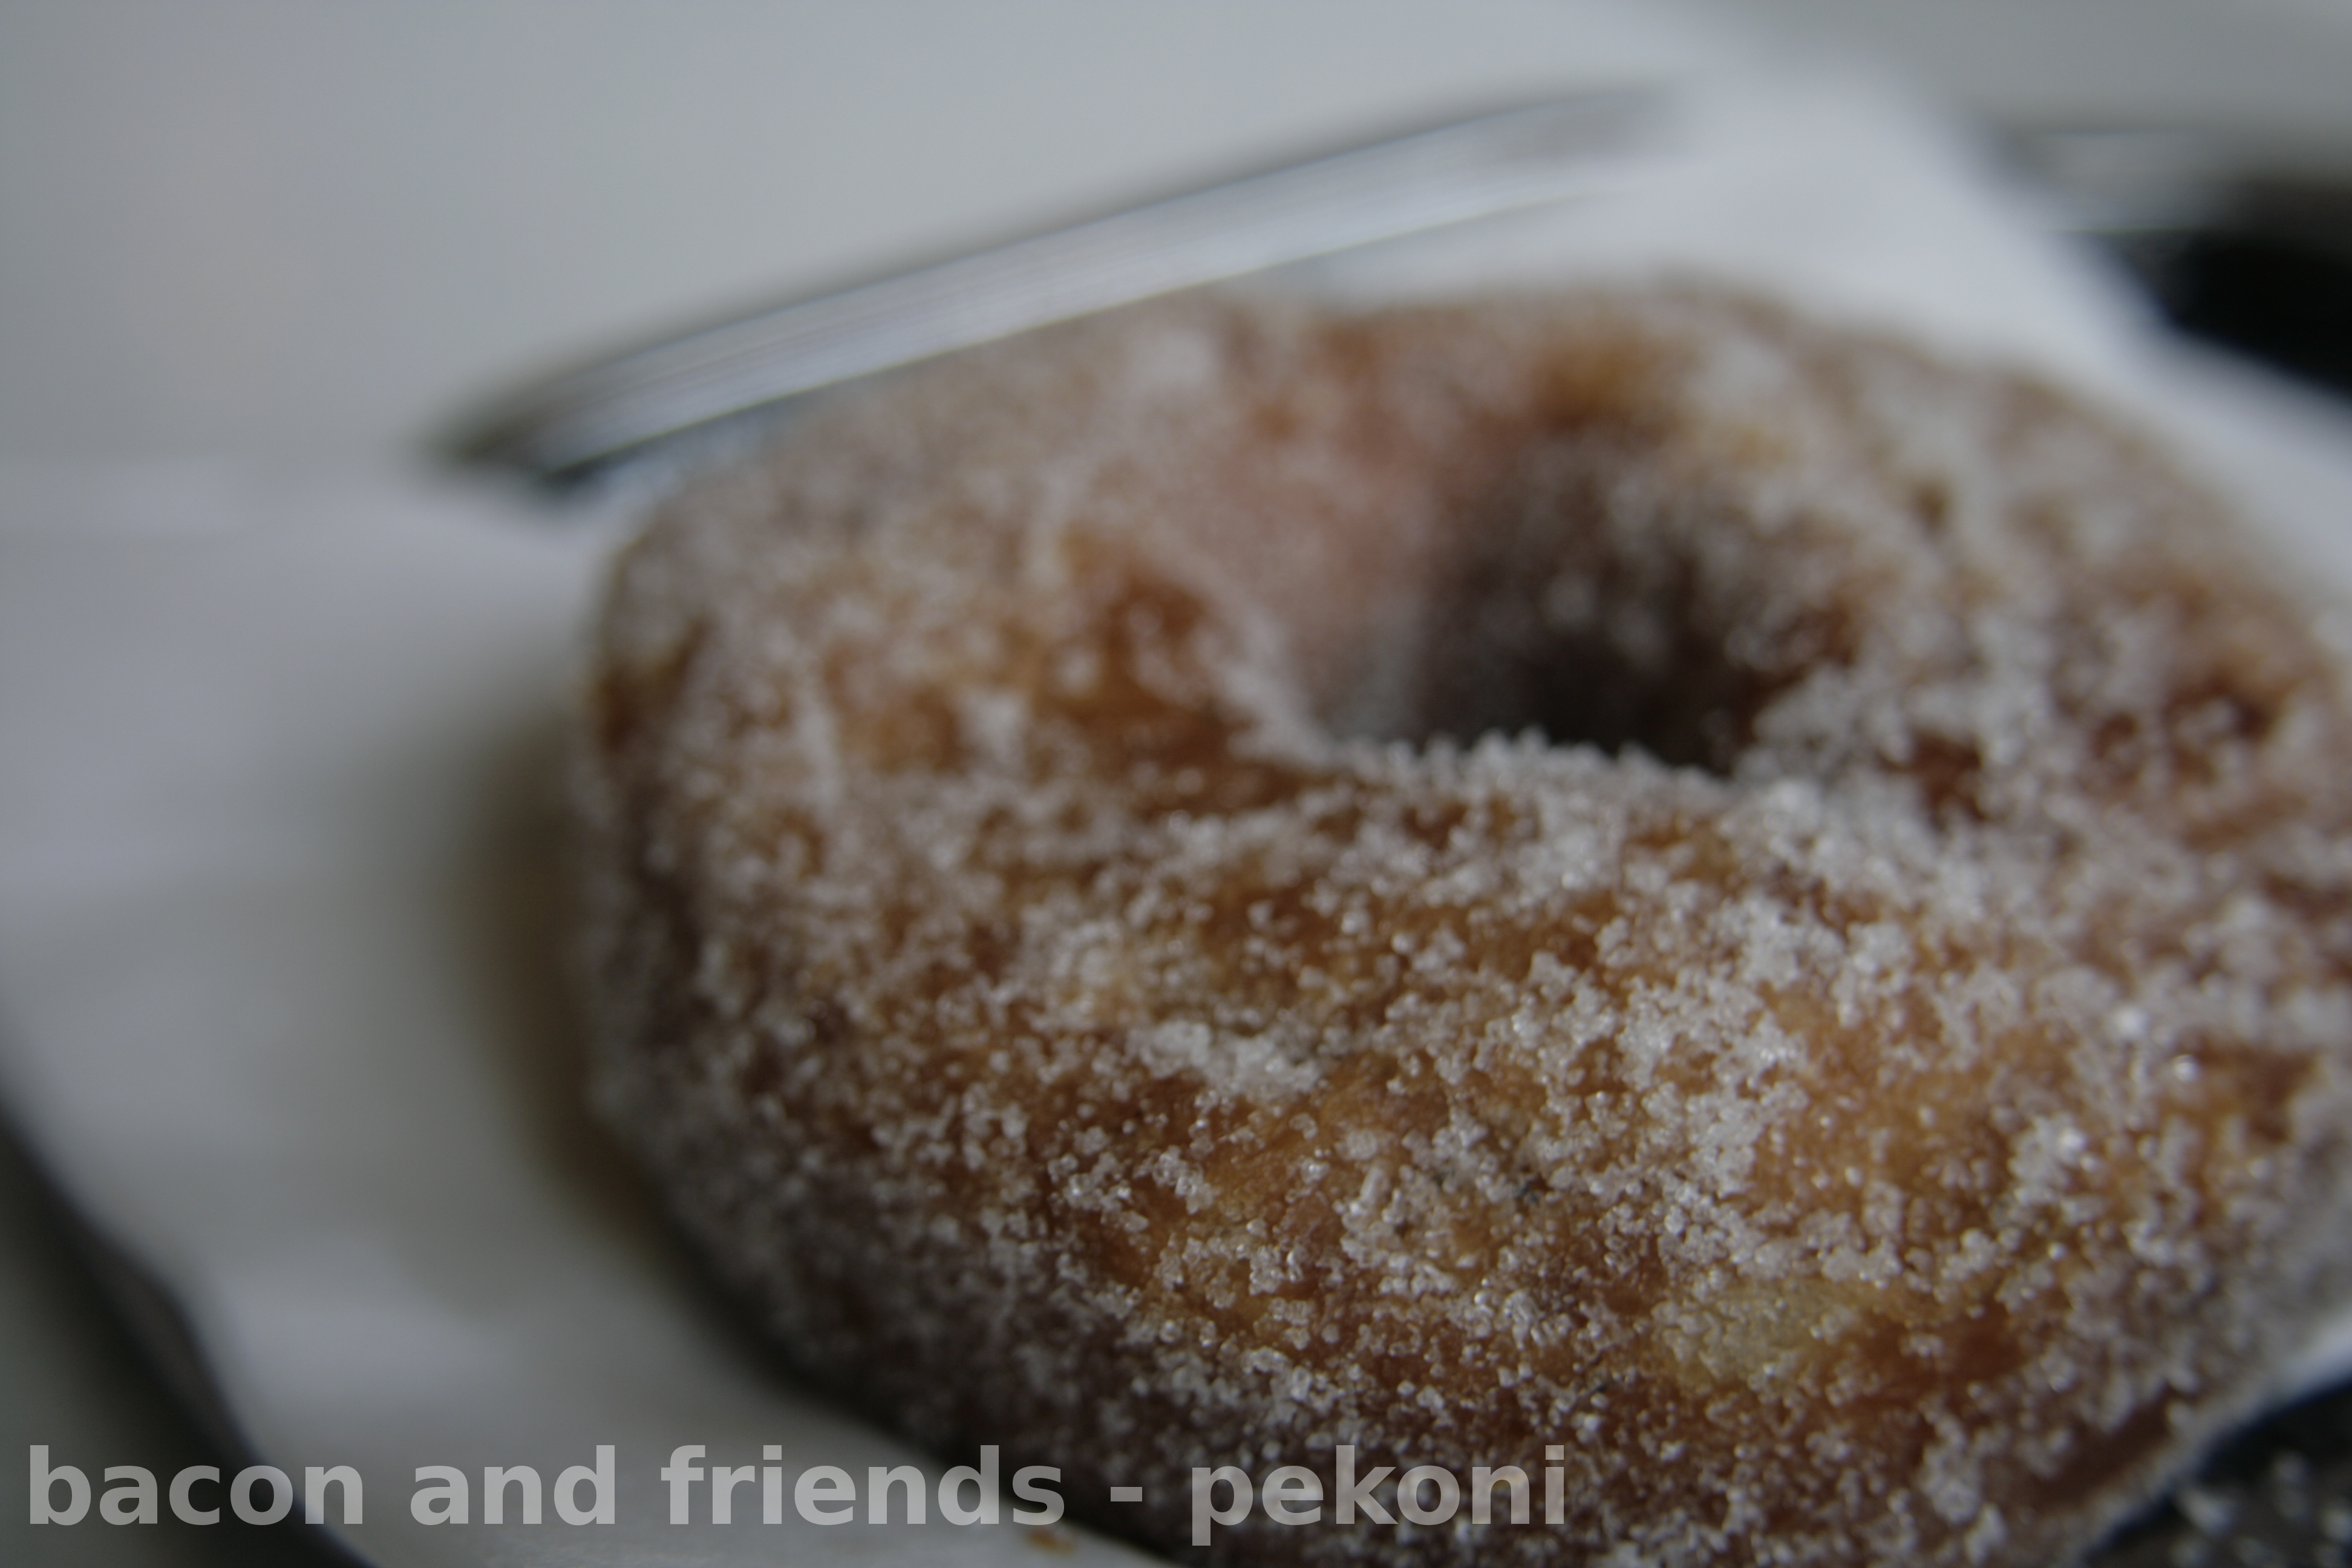 Pyynikin näkötornin kahvila, Tampere: Sugared doughnut